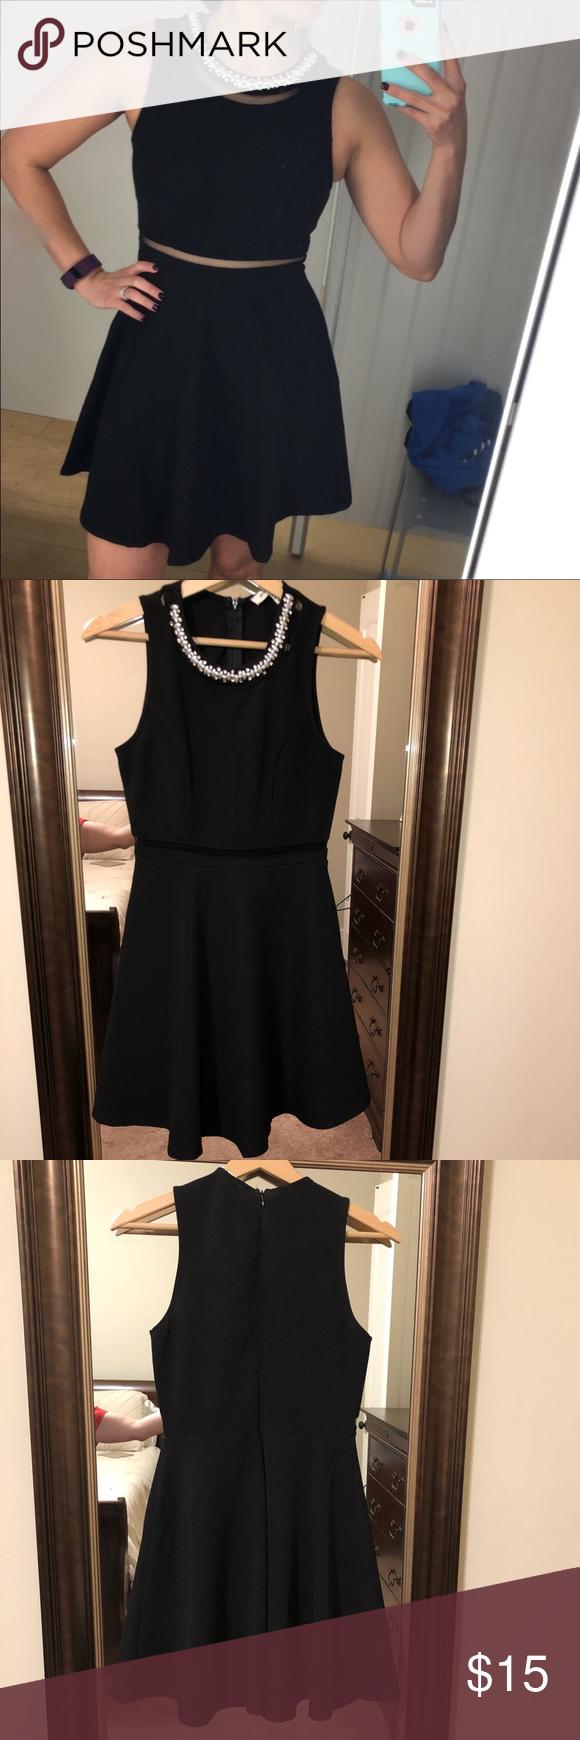 Monteau Little Black Dress With Pearls Black Dress Little Black Dress Black Dress With Pearls [ 1740 x 580 Pixel ]